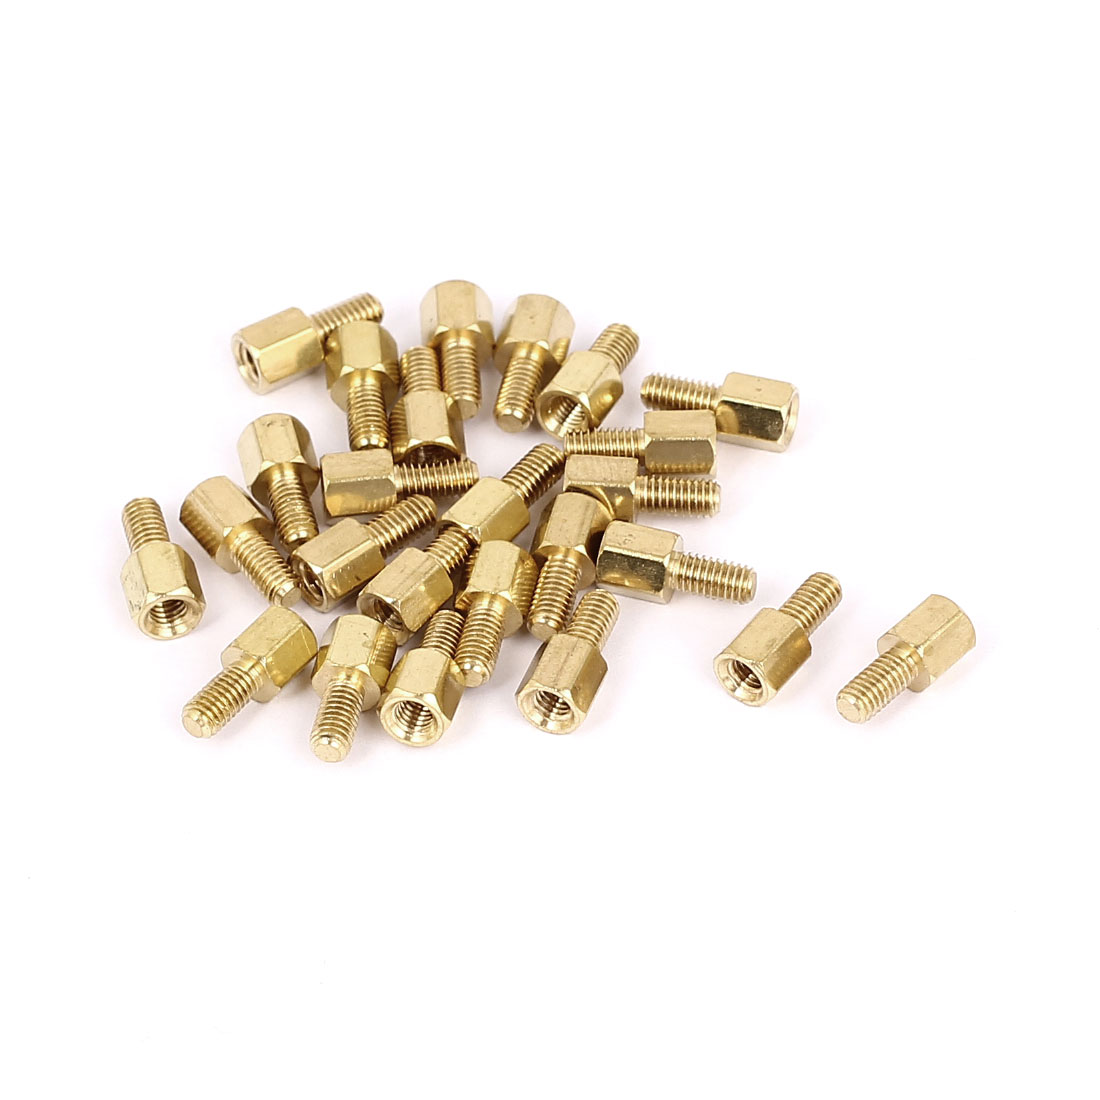 M3x5+6mm Female/Male Threaded Brass Hex Standoff Pillar Spacer Coupler Nut 25pcs